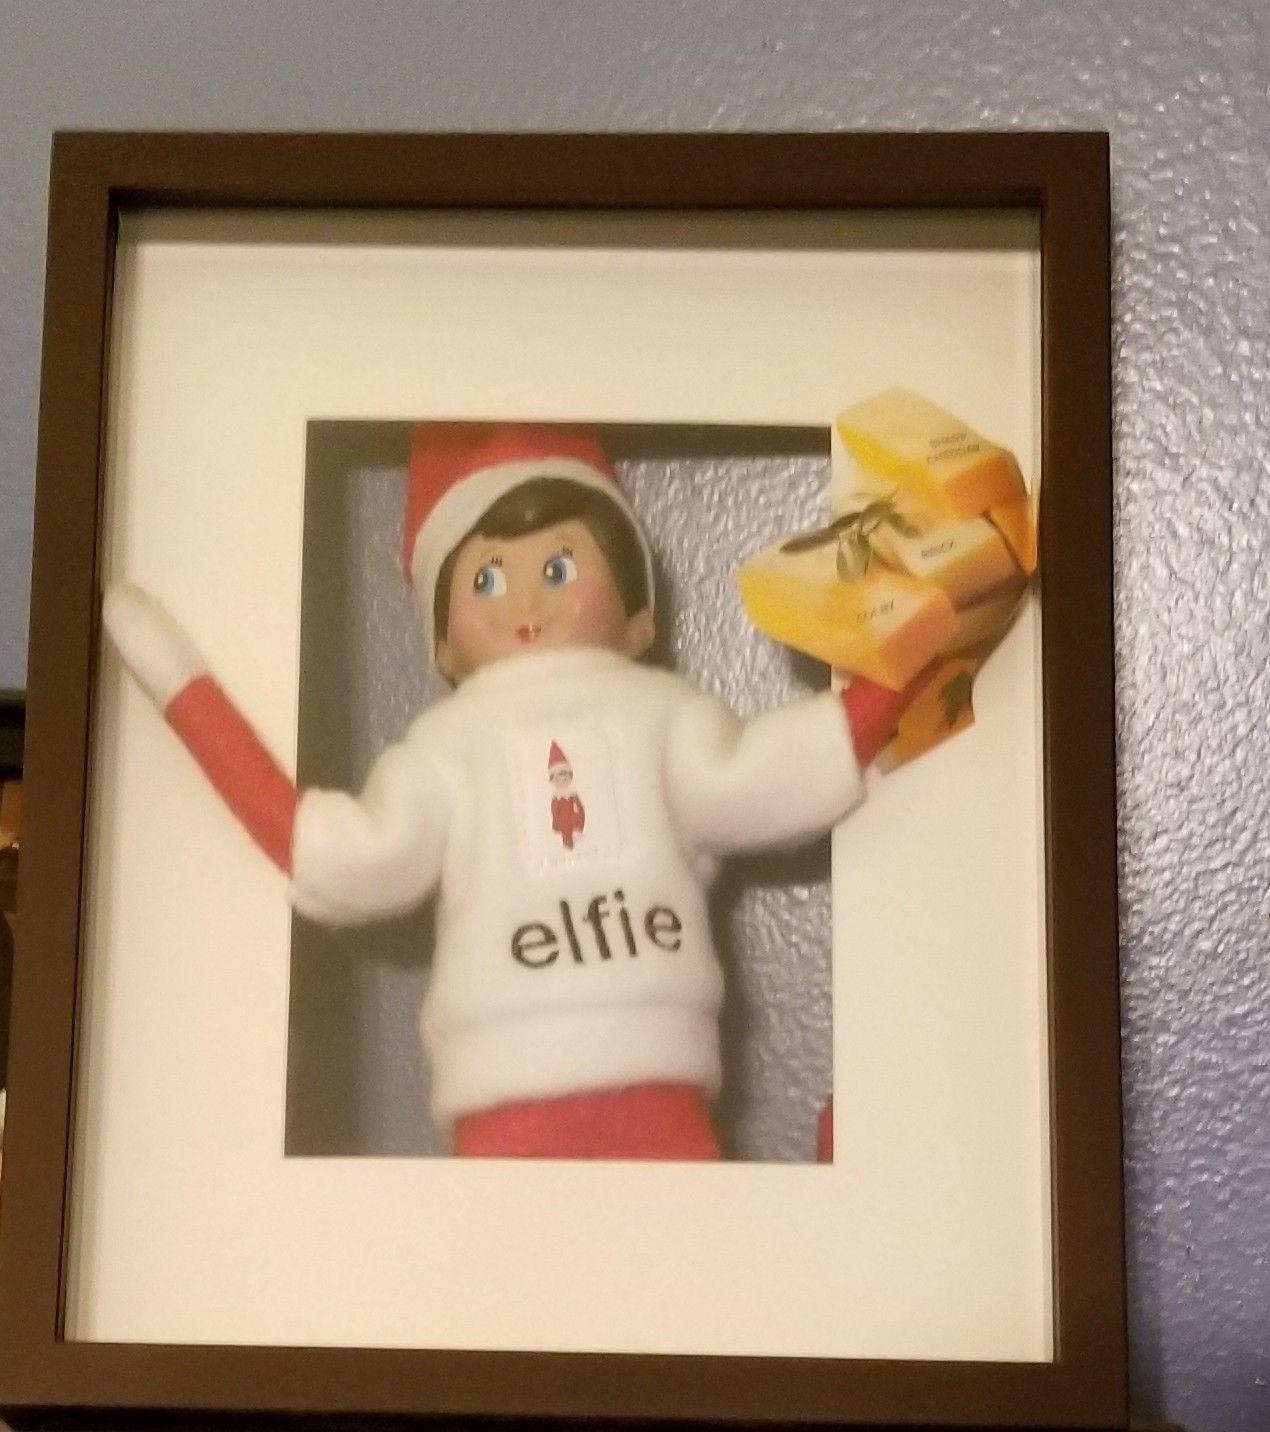 Say Cheese! Taking An Elfie